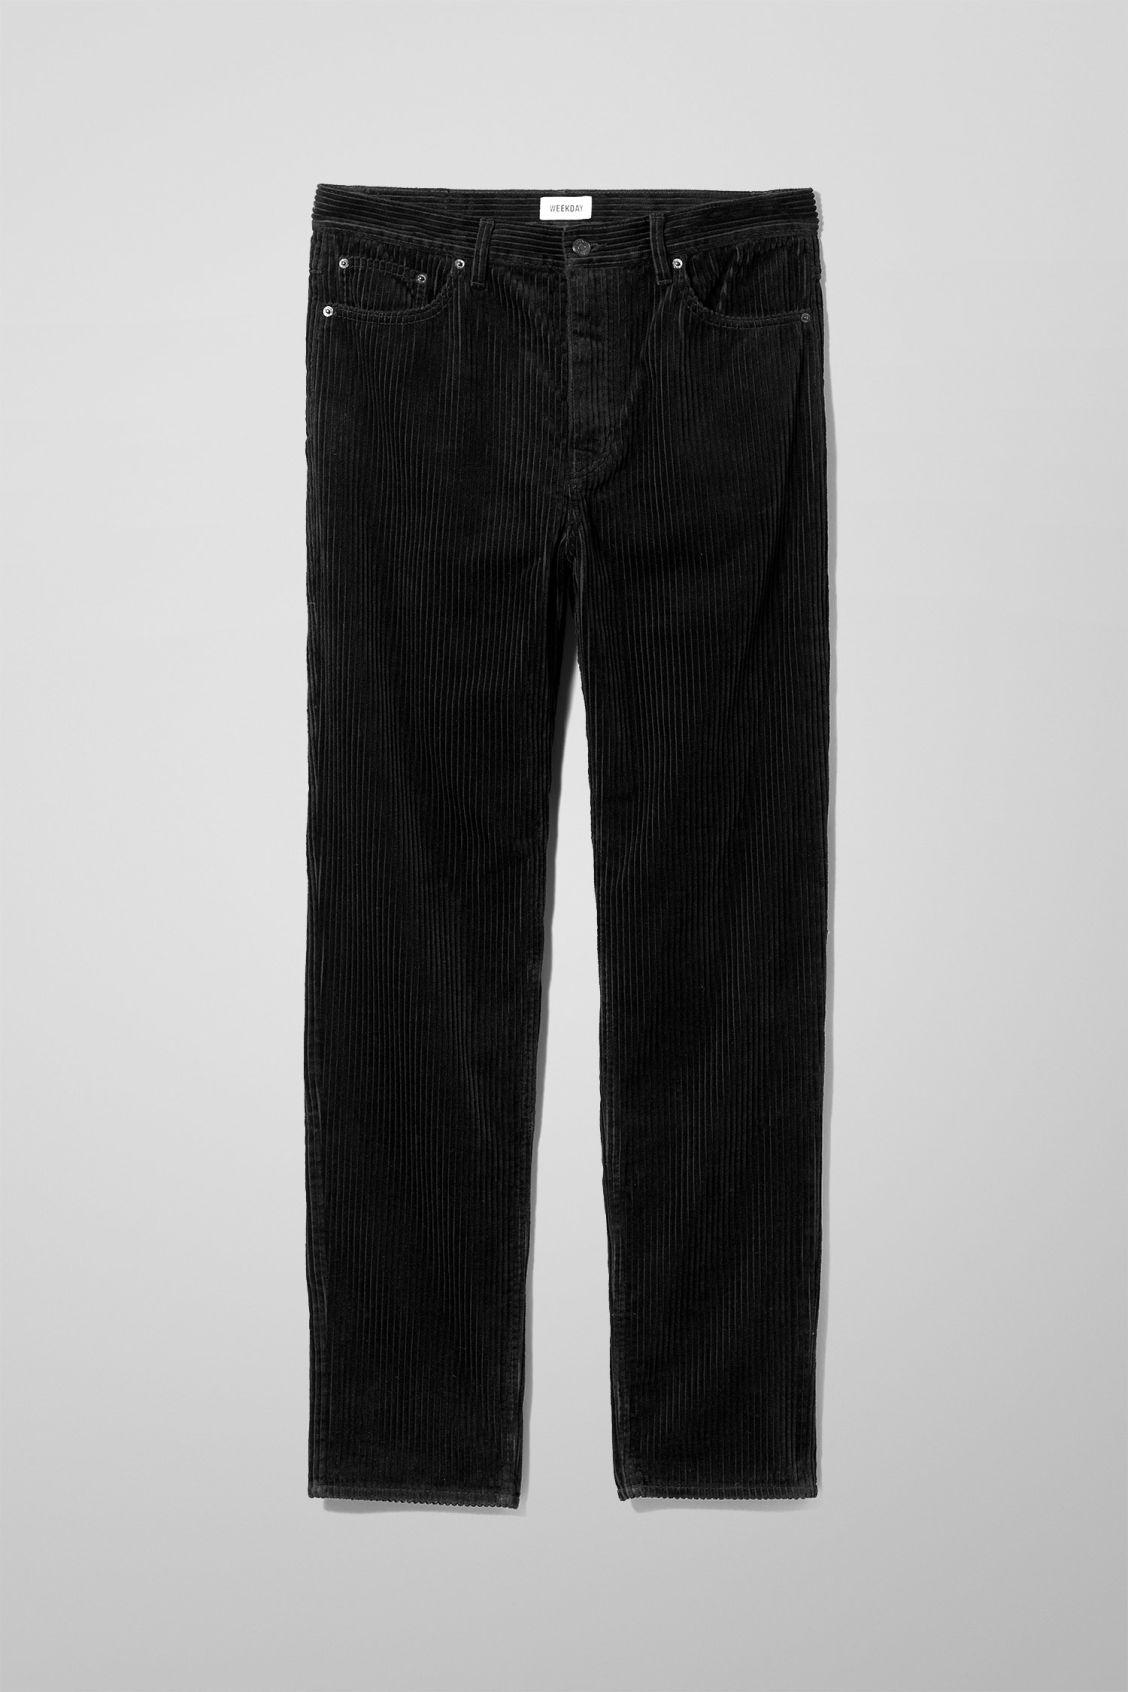 Svante Cord Trousers - Black